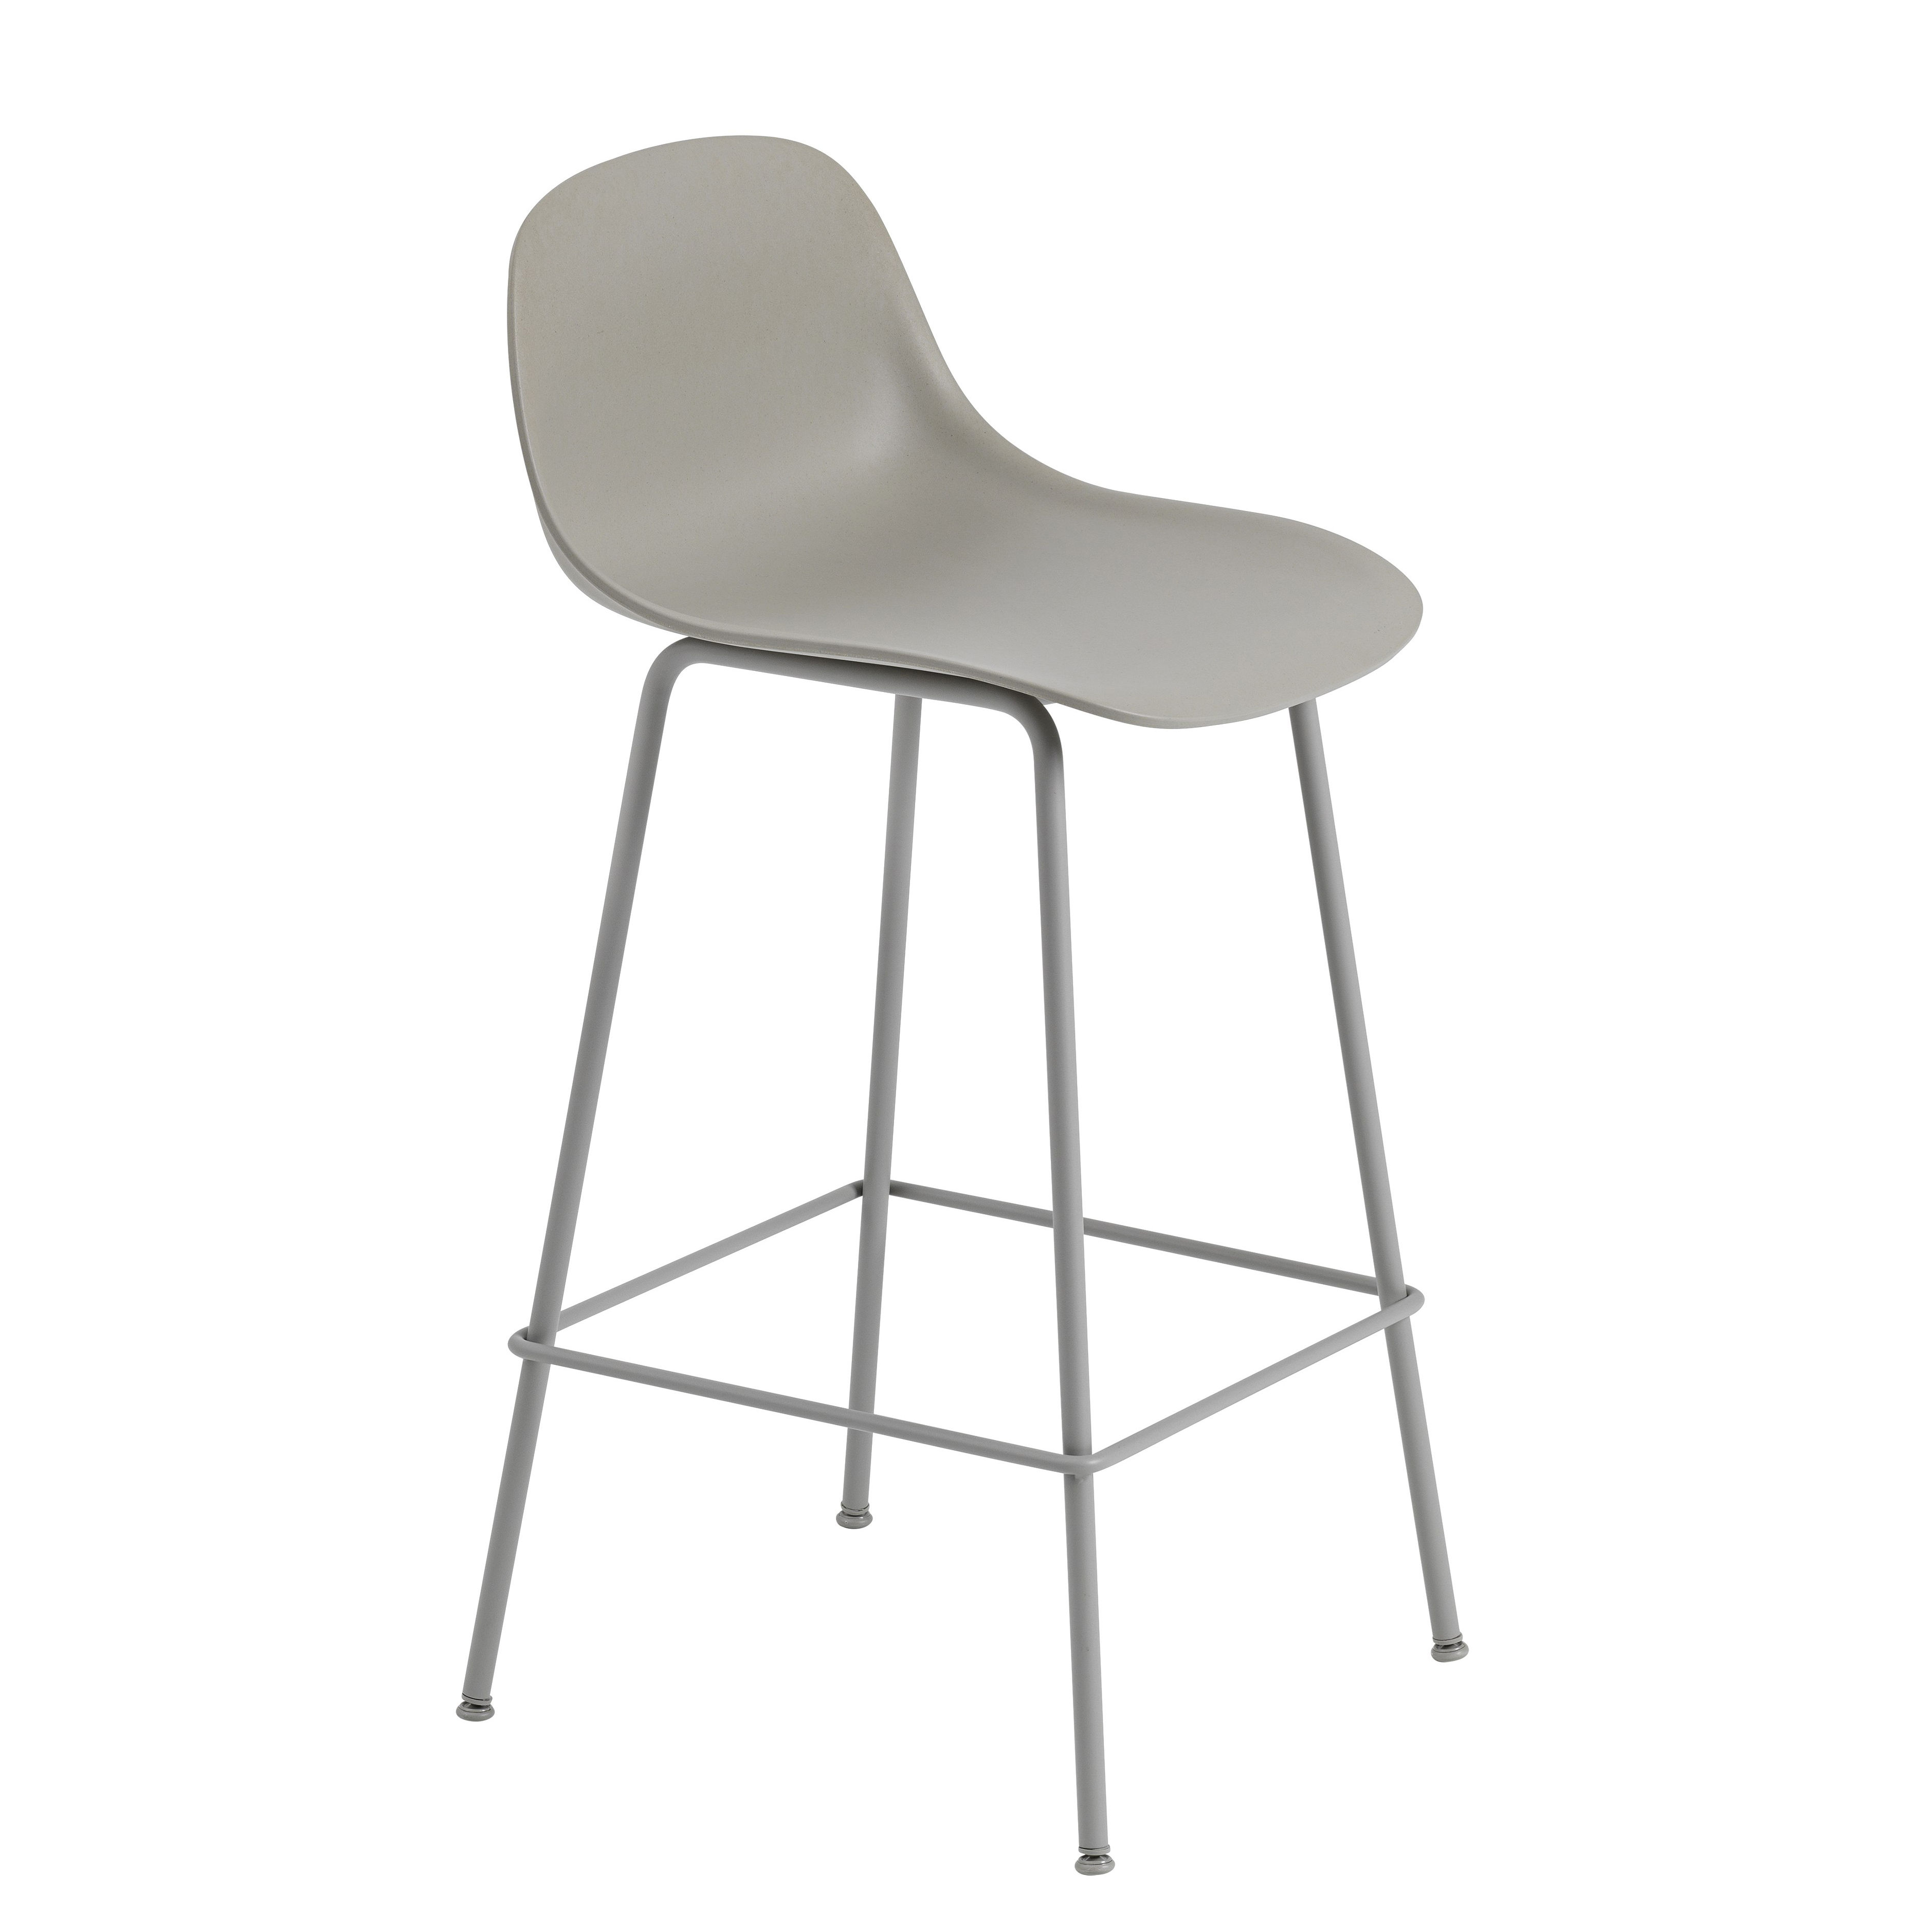 Möbel - Barhocker - Fiber Bar Hochstuhl / H 65 cm - Metallfüße - Muuto - Grau - bemalter Stahl, Recyceltes Verbundmaterial